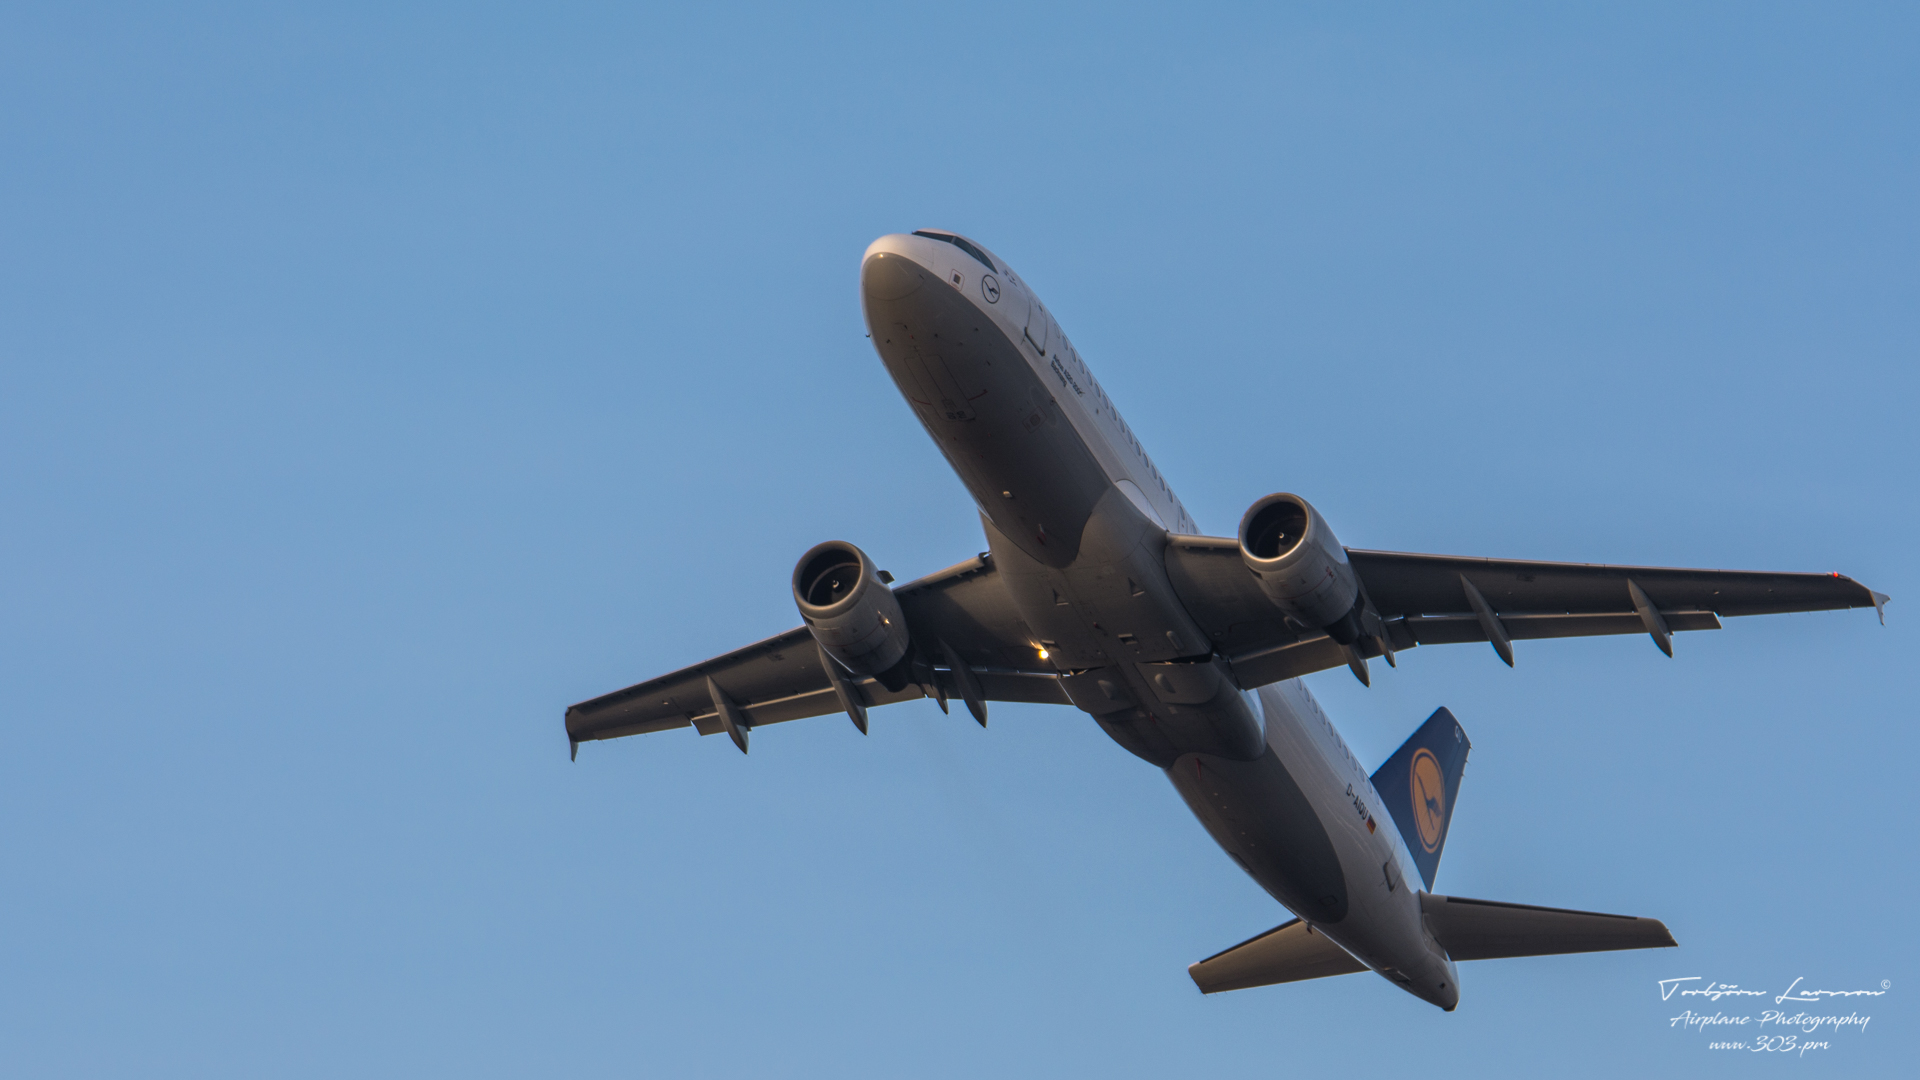 ACE_7074-Airbus A320-211 - Lufthansa D-AIQU